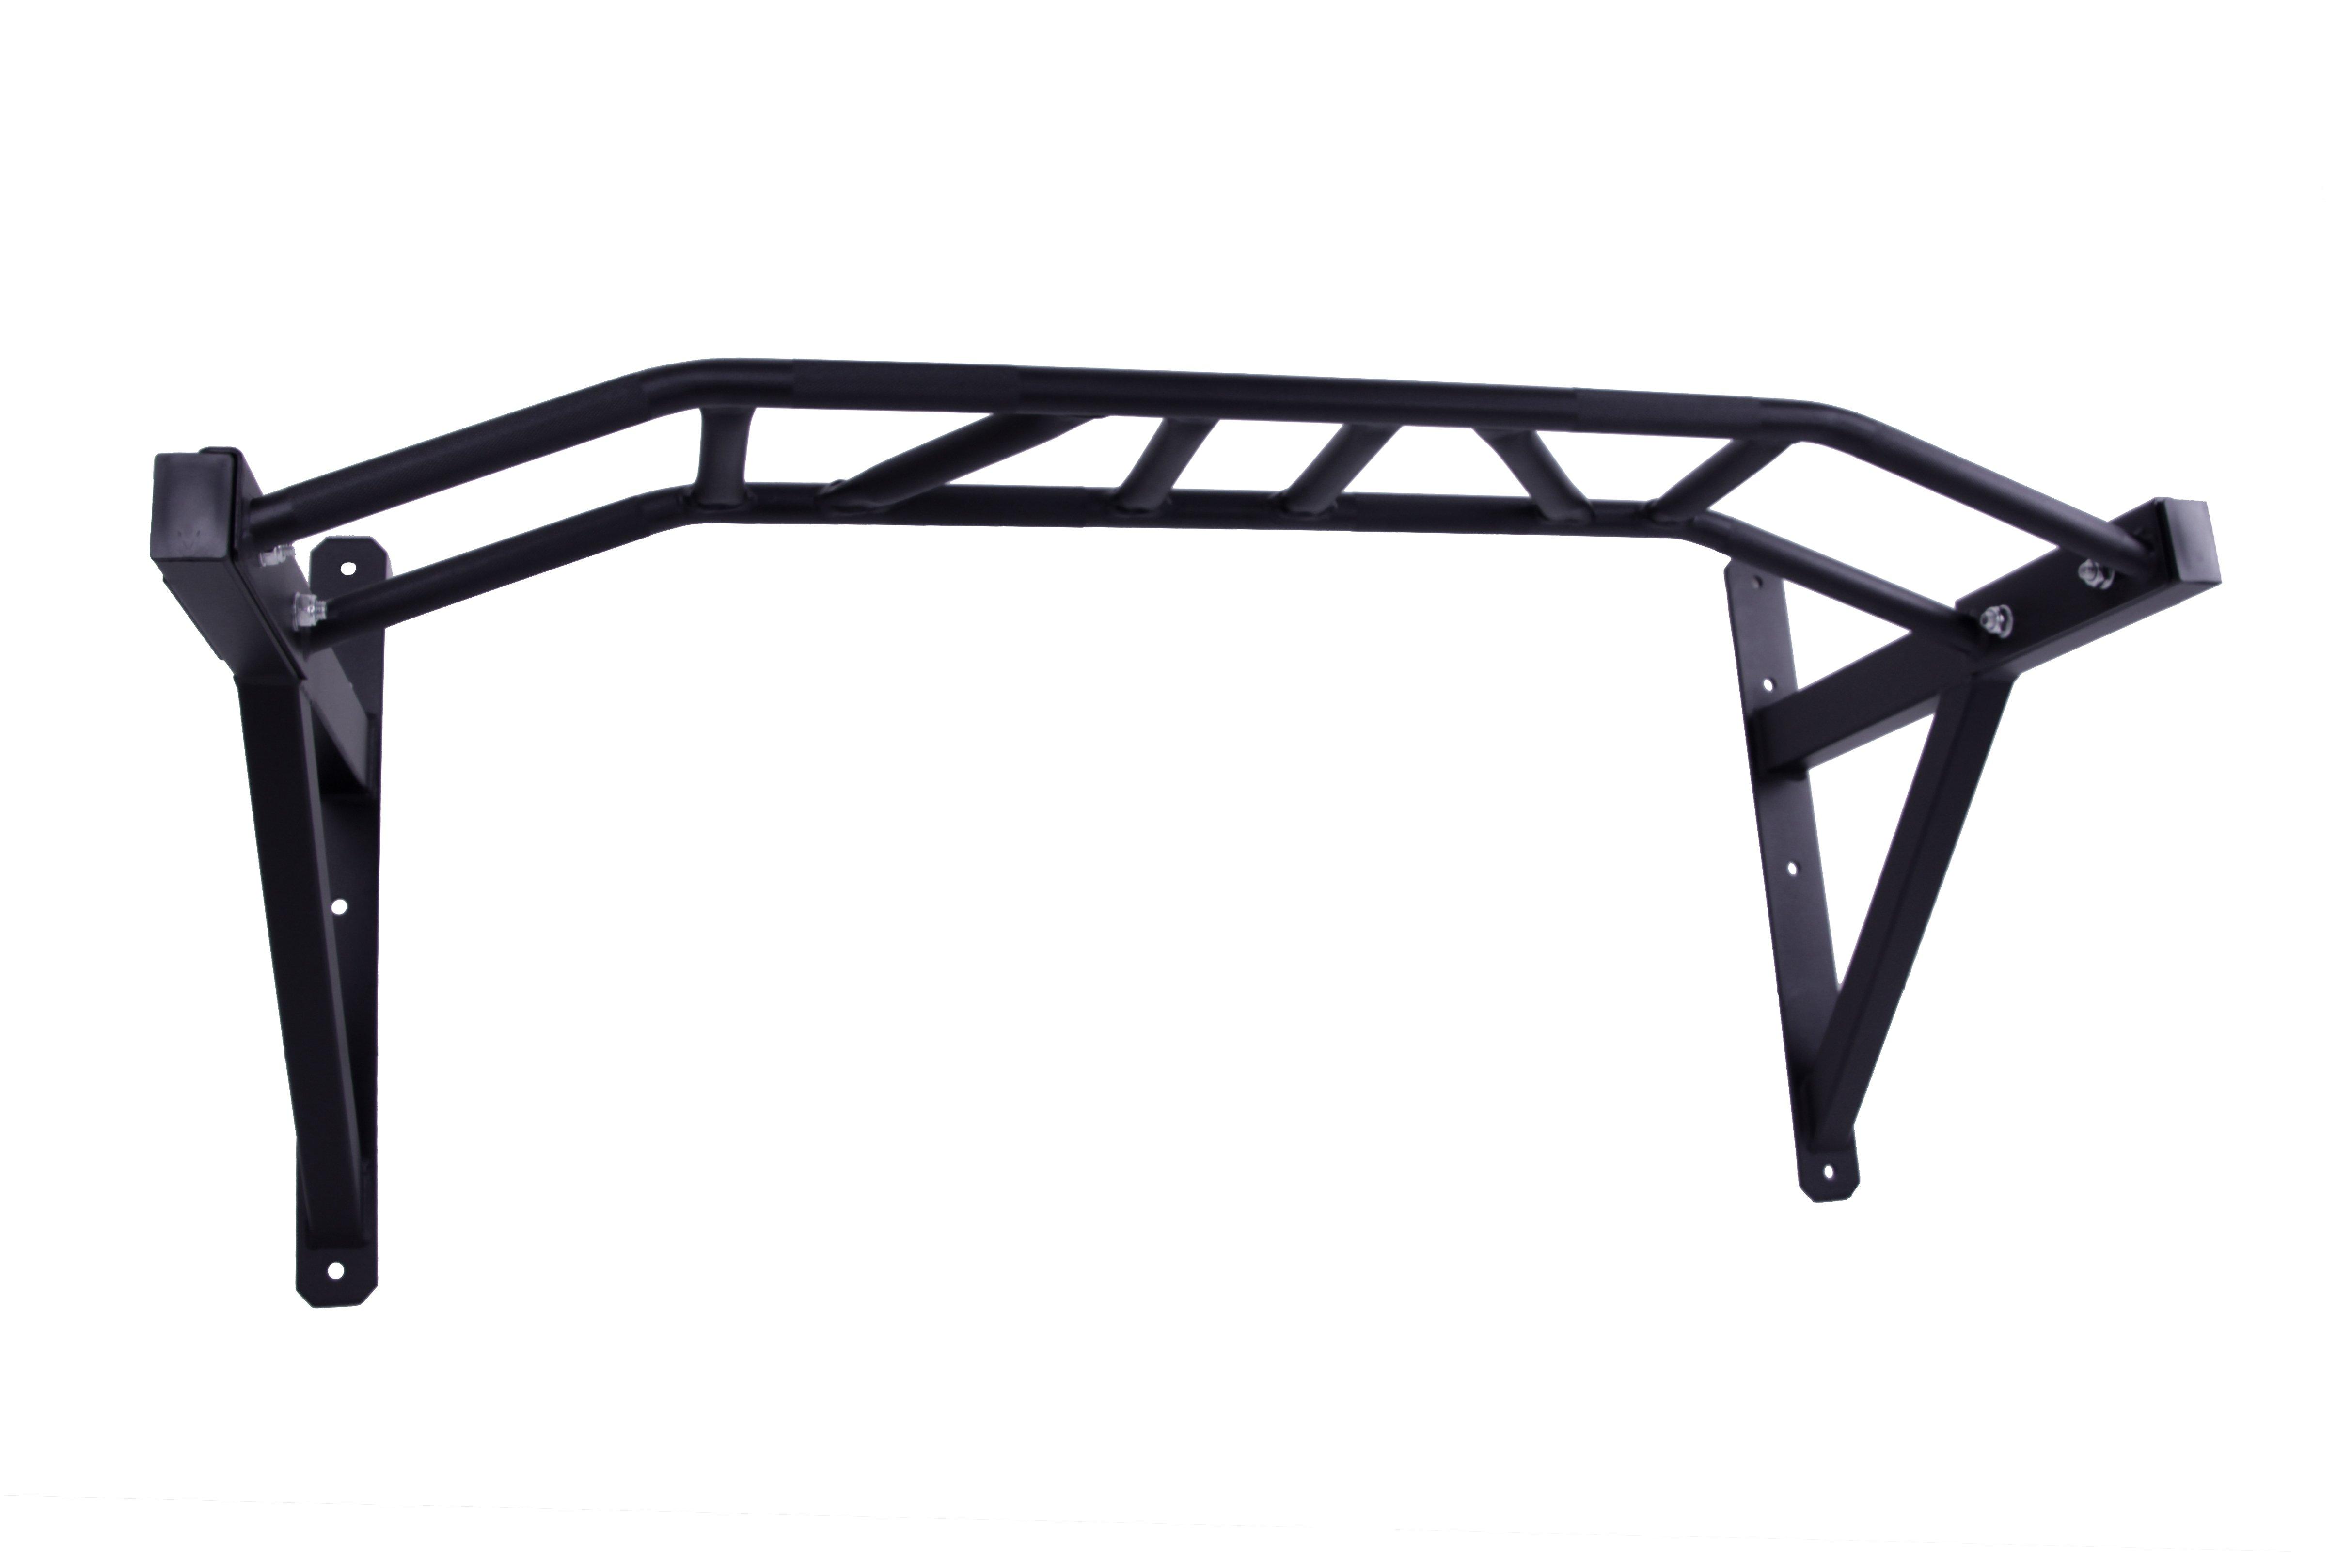 Crossmaxx Multi-Grip Pull-Up Rack Black